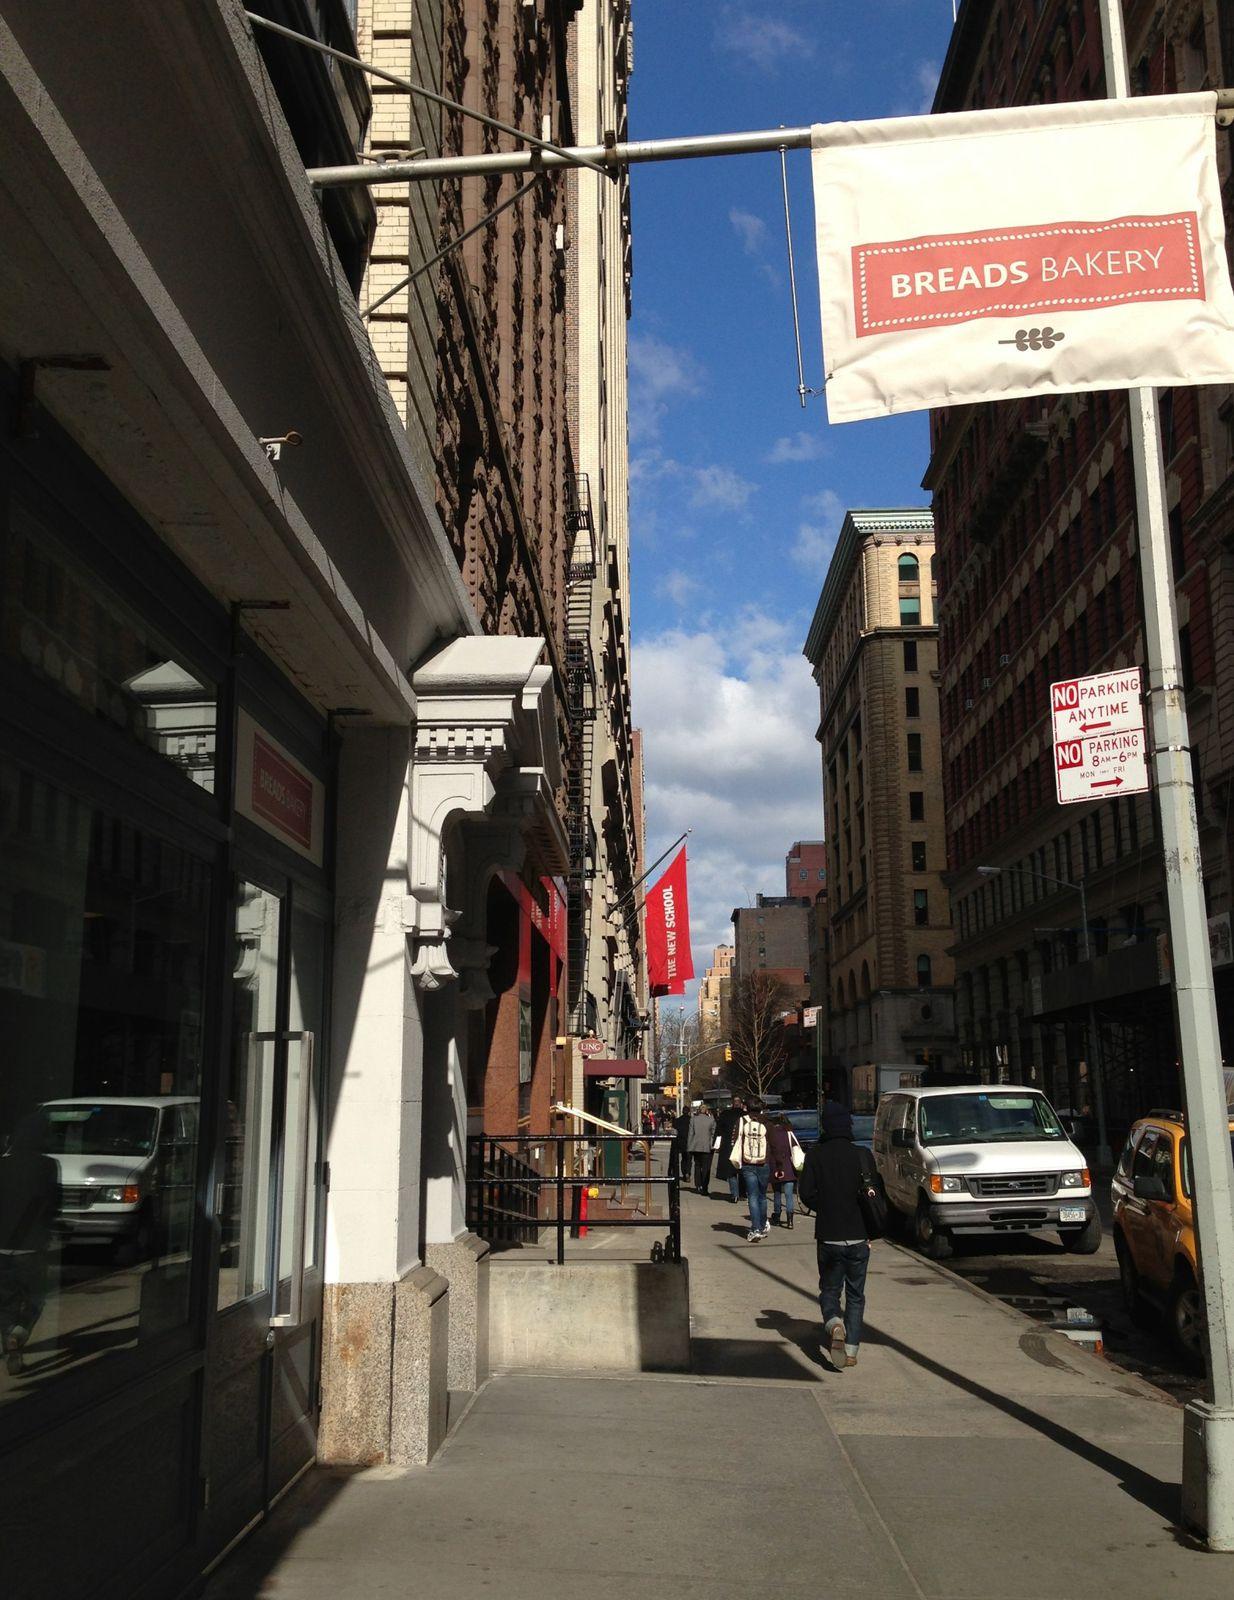 Breads bakery à NewYork